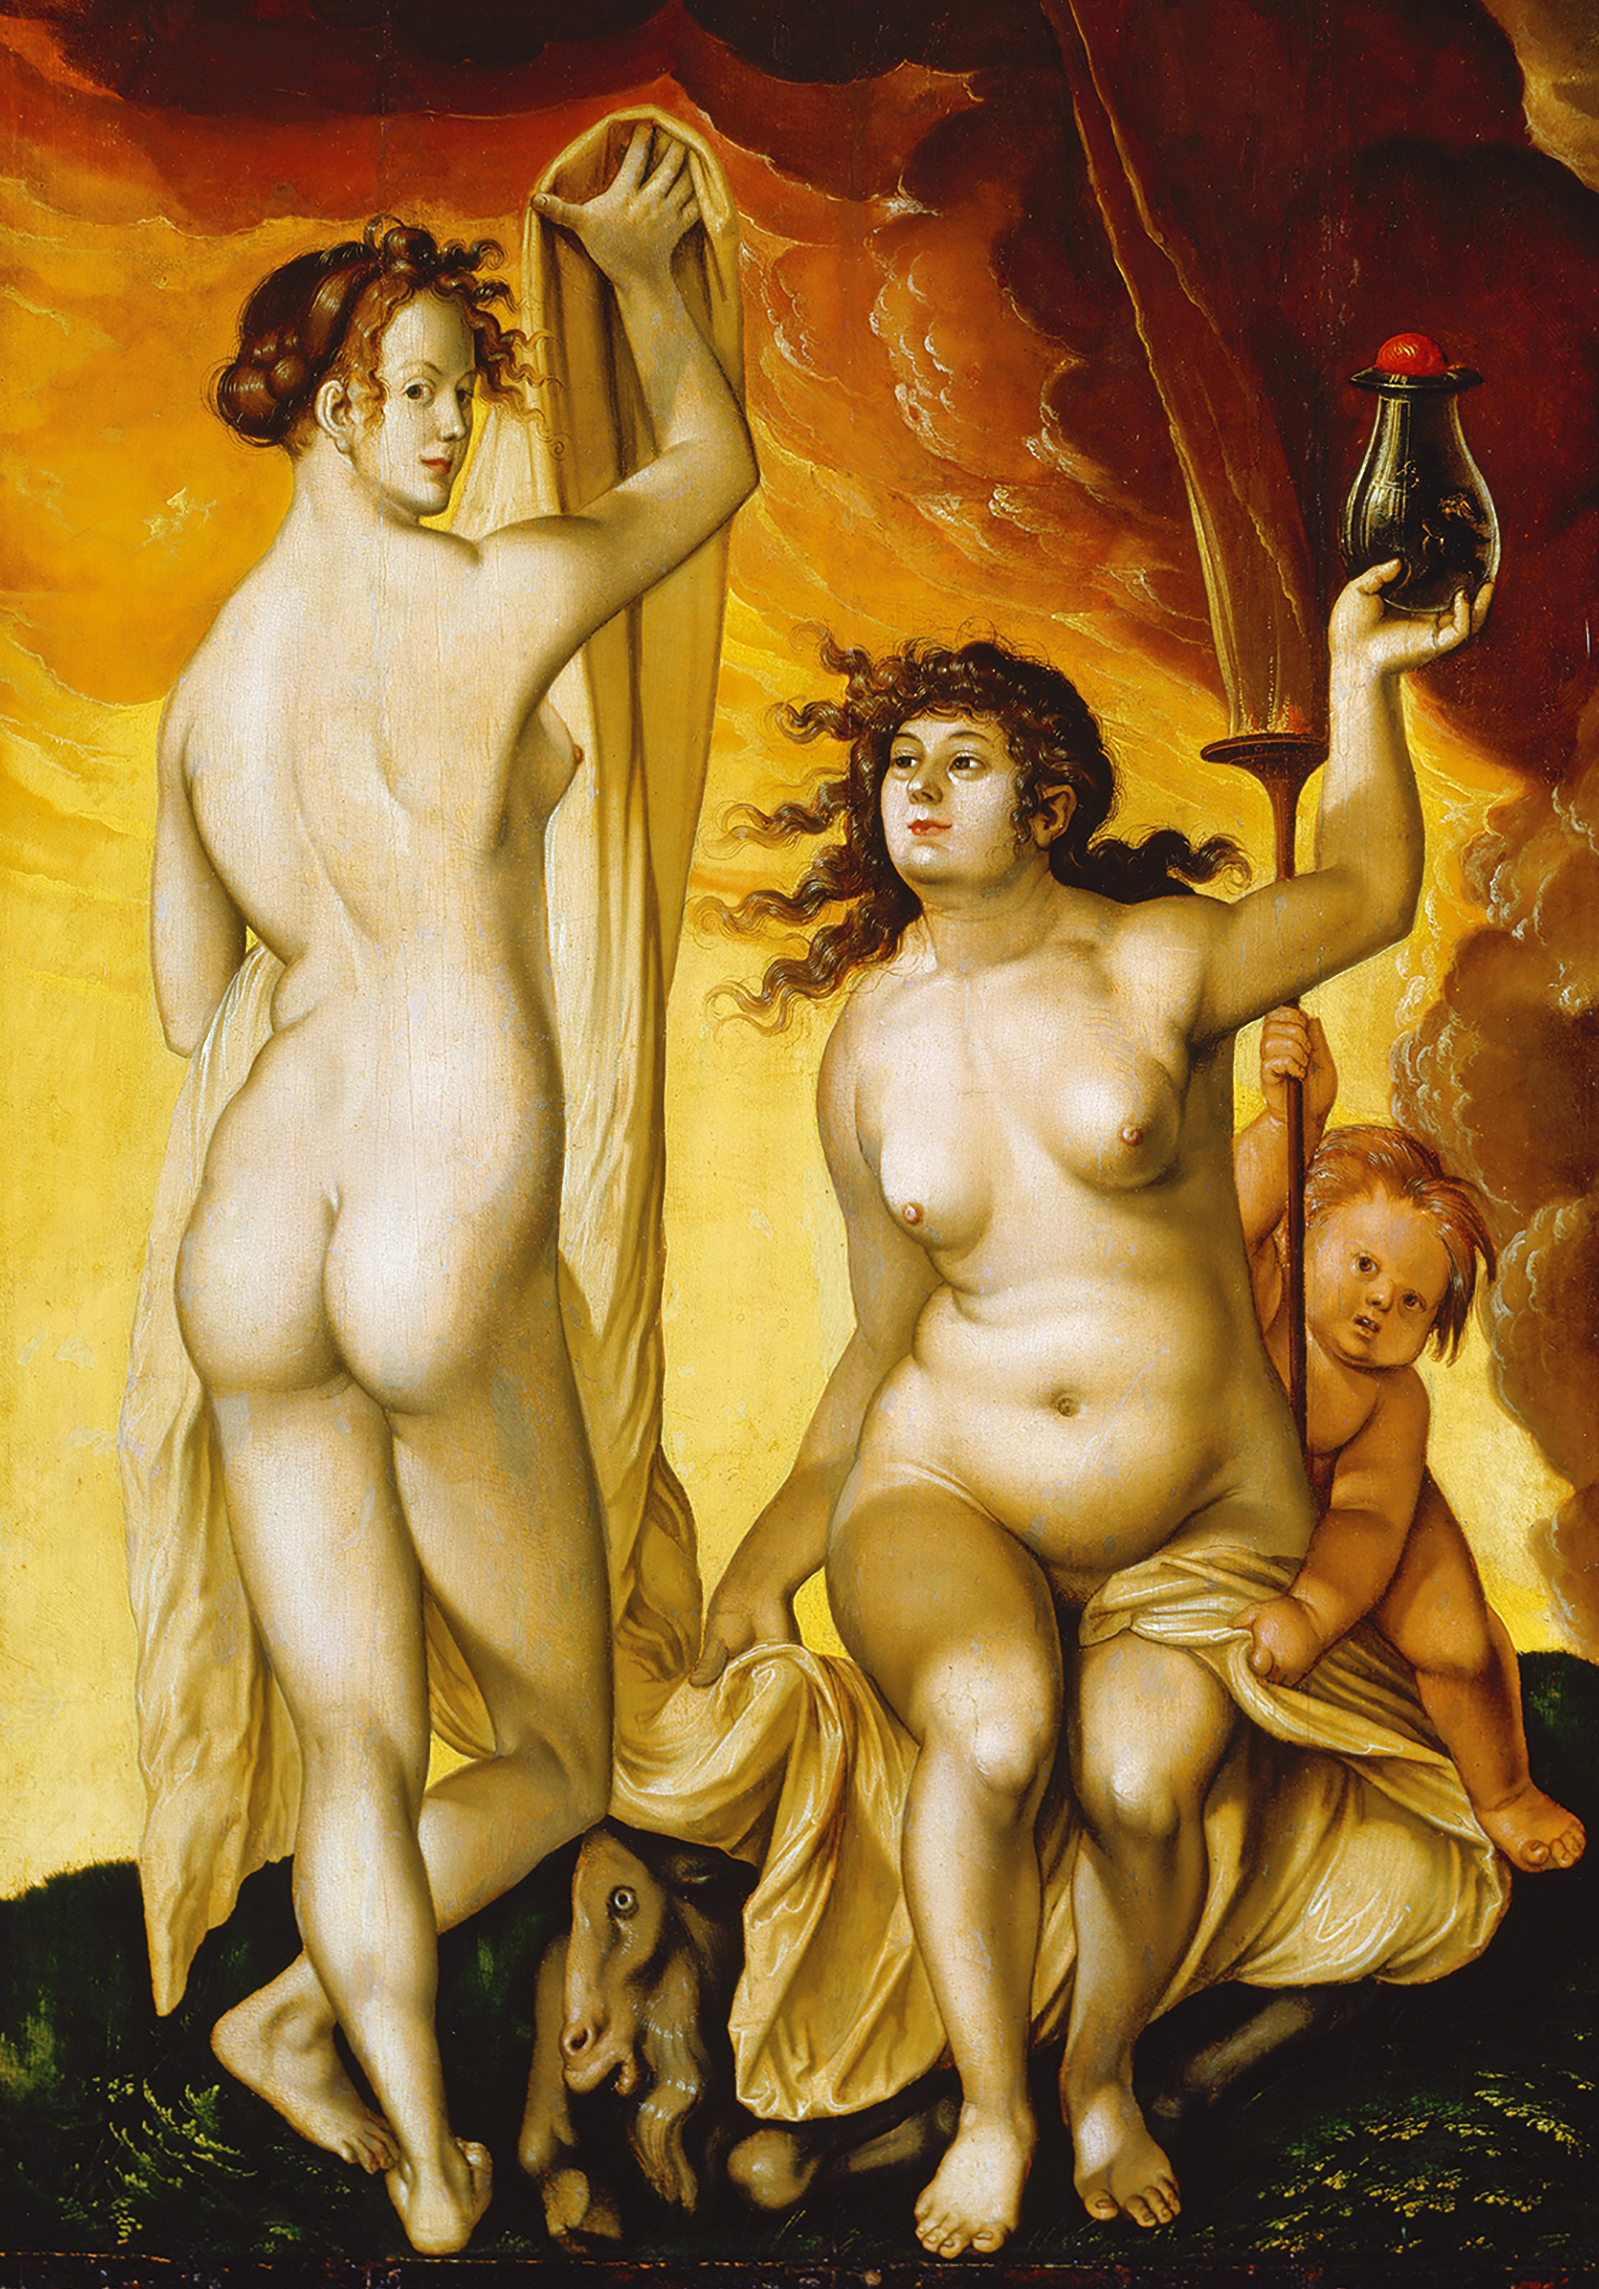 X-TRA → Nude Nuder Nudist